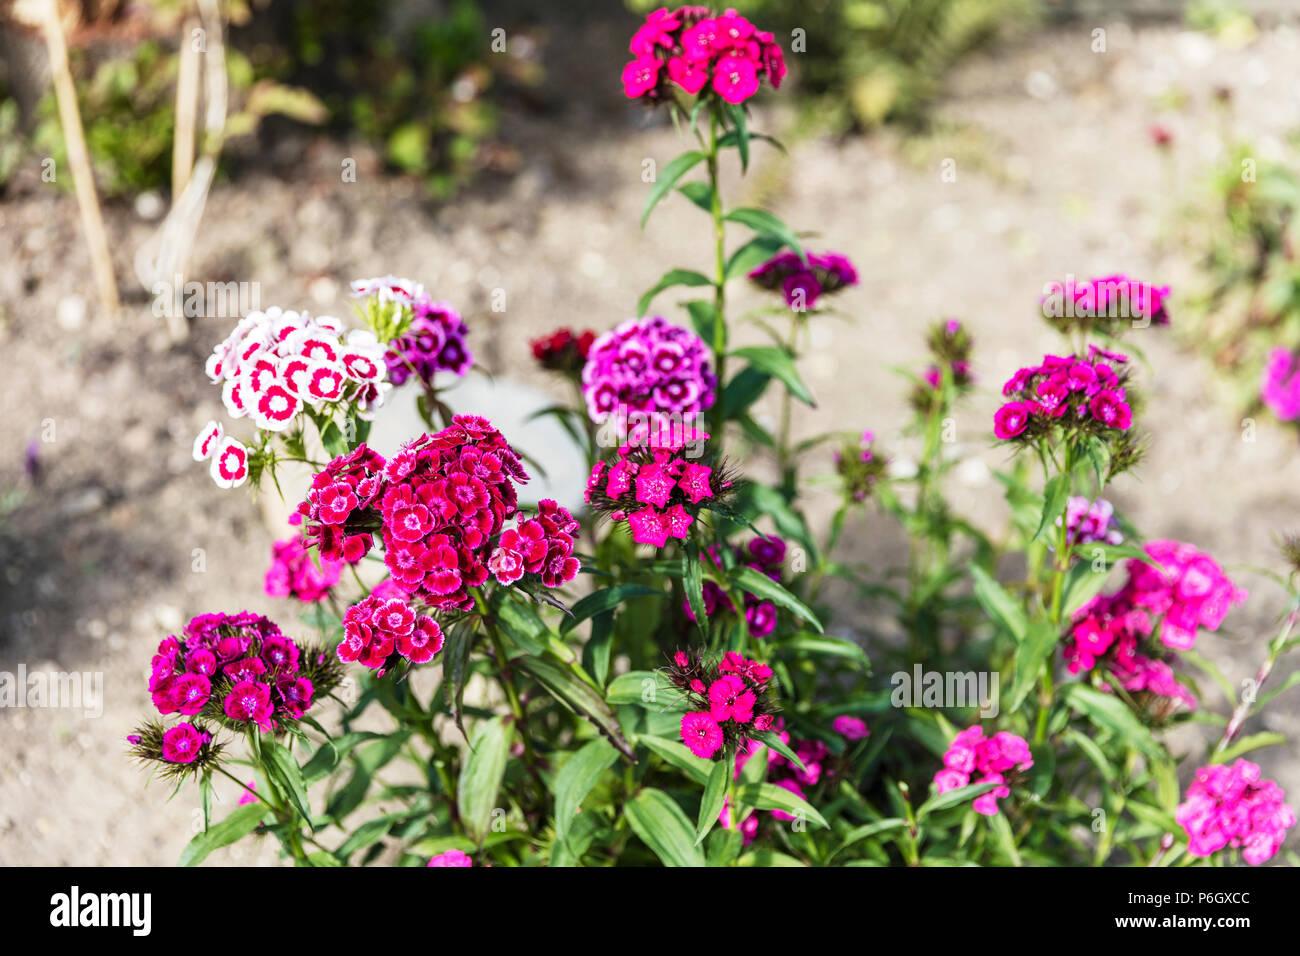 Sweet Williams flowers, Dianthus barbatus Sweet William flowers in Summer, Sweet William plants, flowering Sweet William plants, flowers, plants, - Stock Image